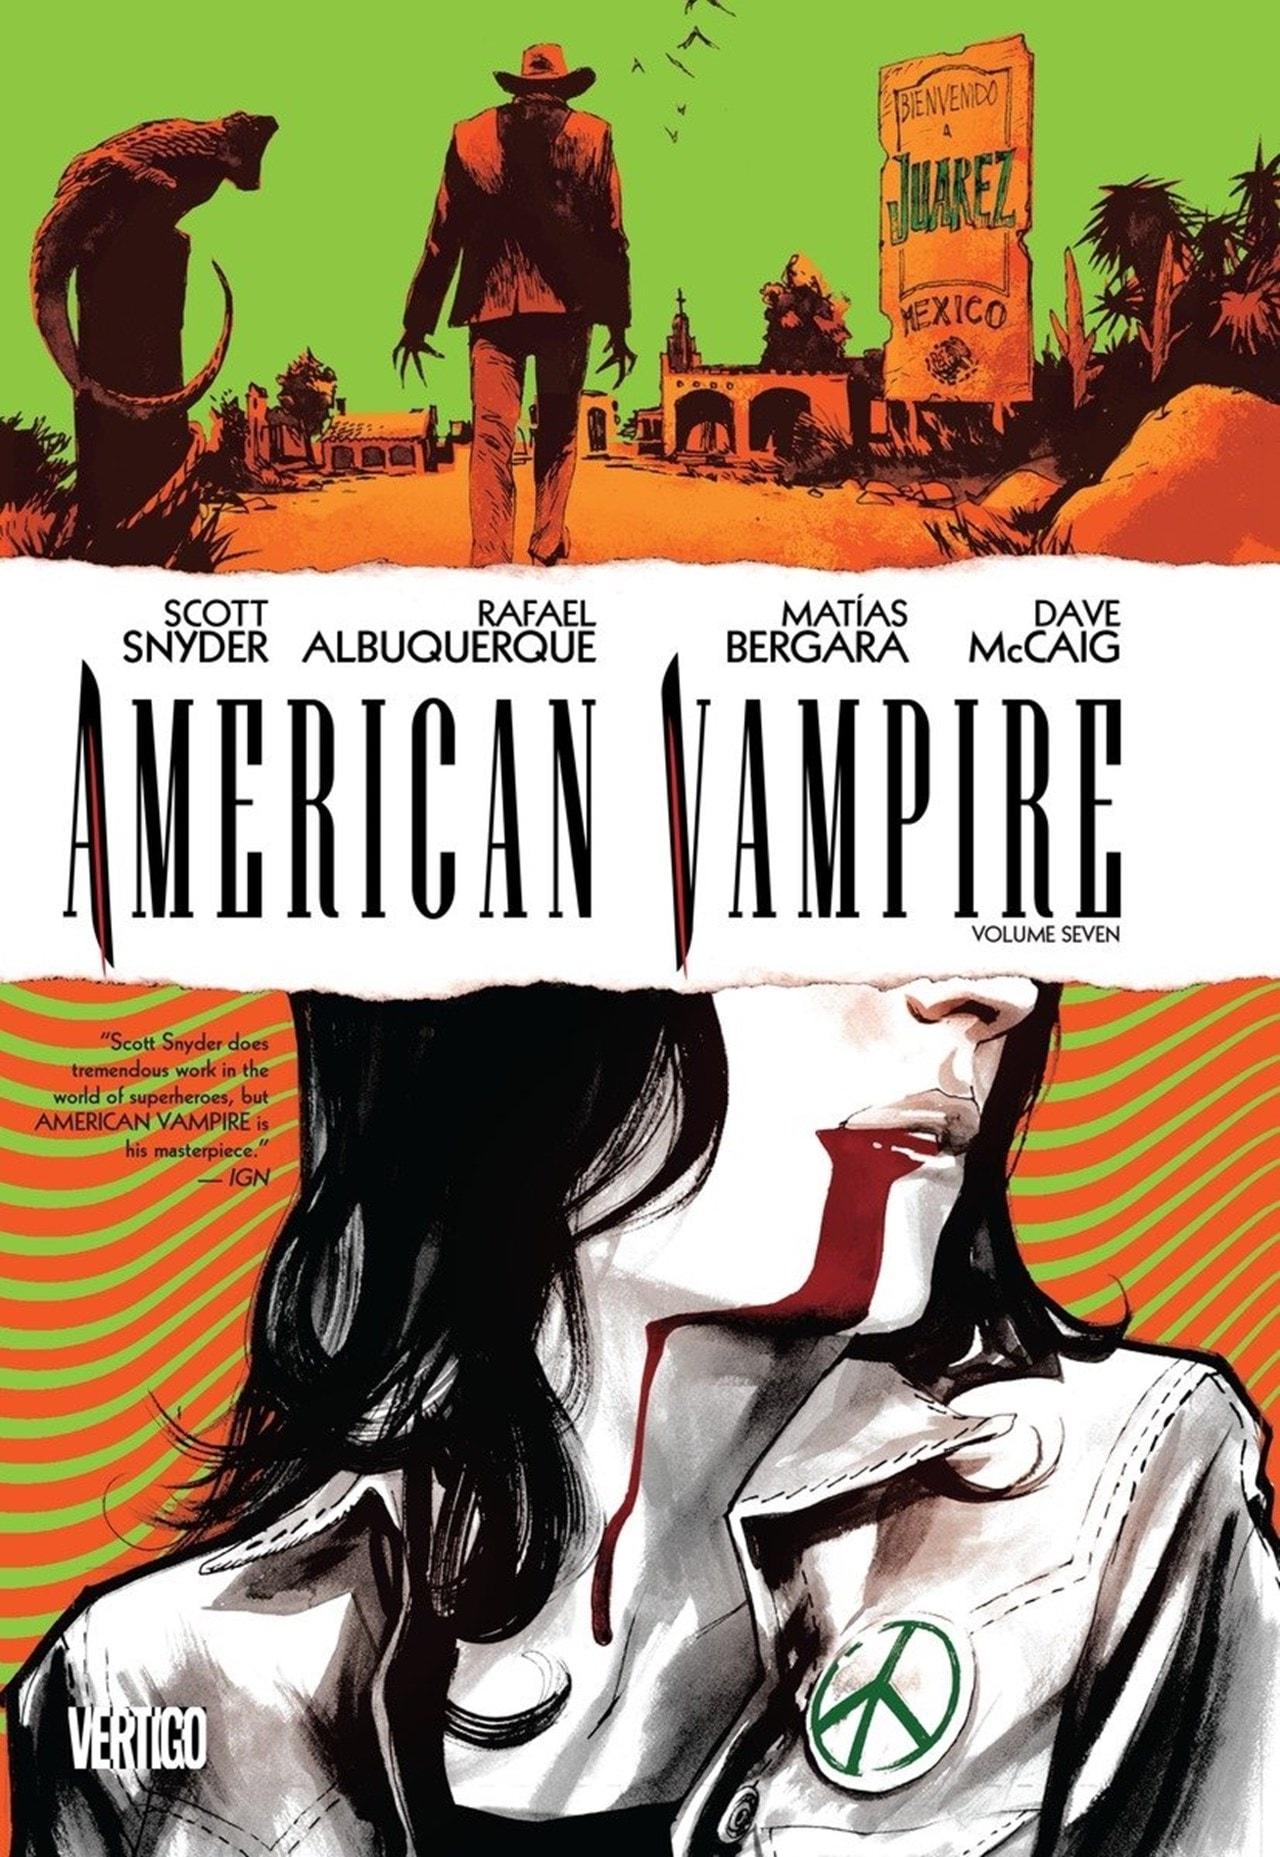 American Vampire Vol. 7 - 1